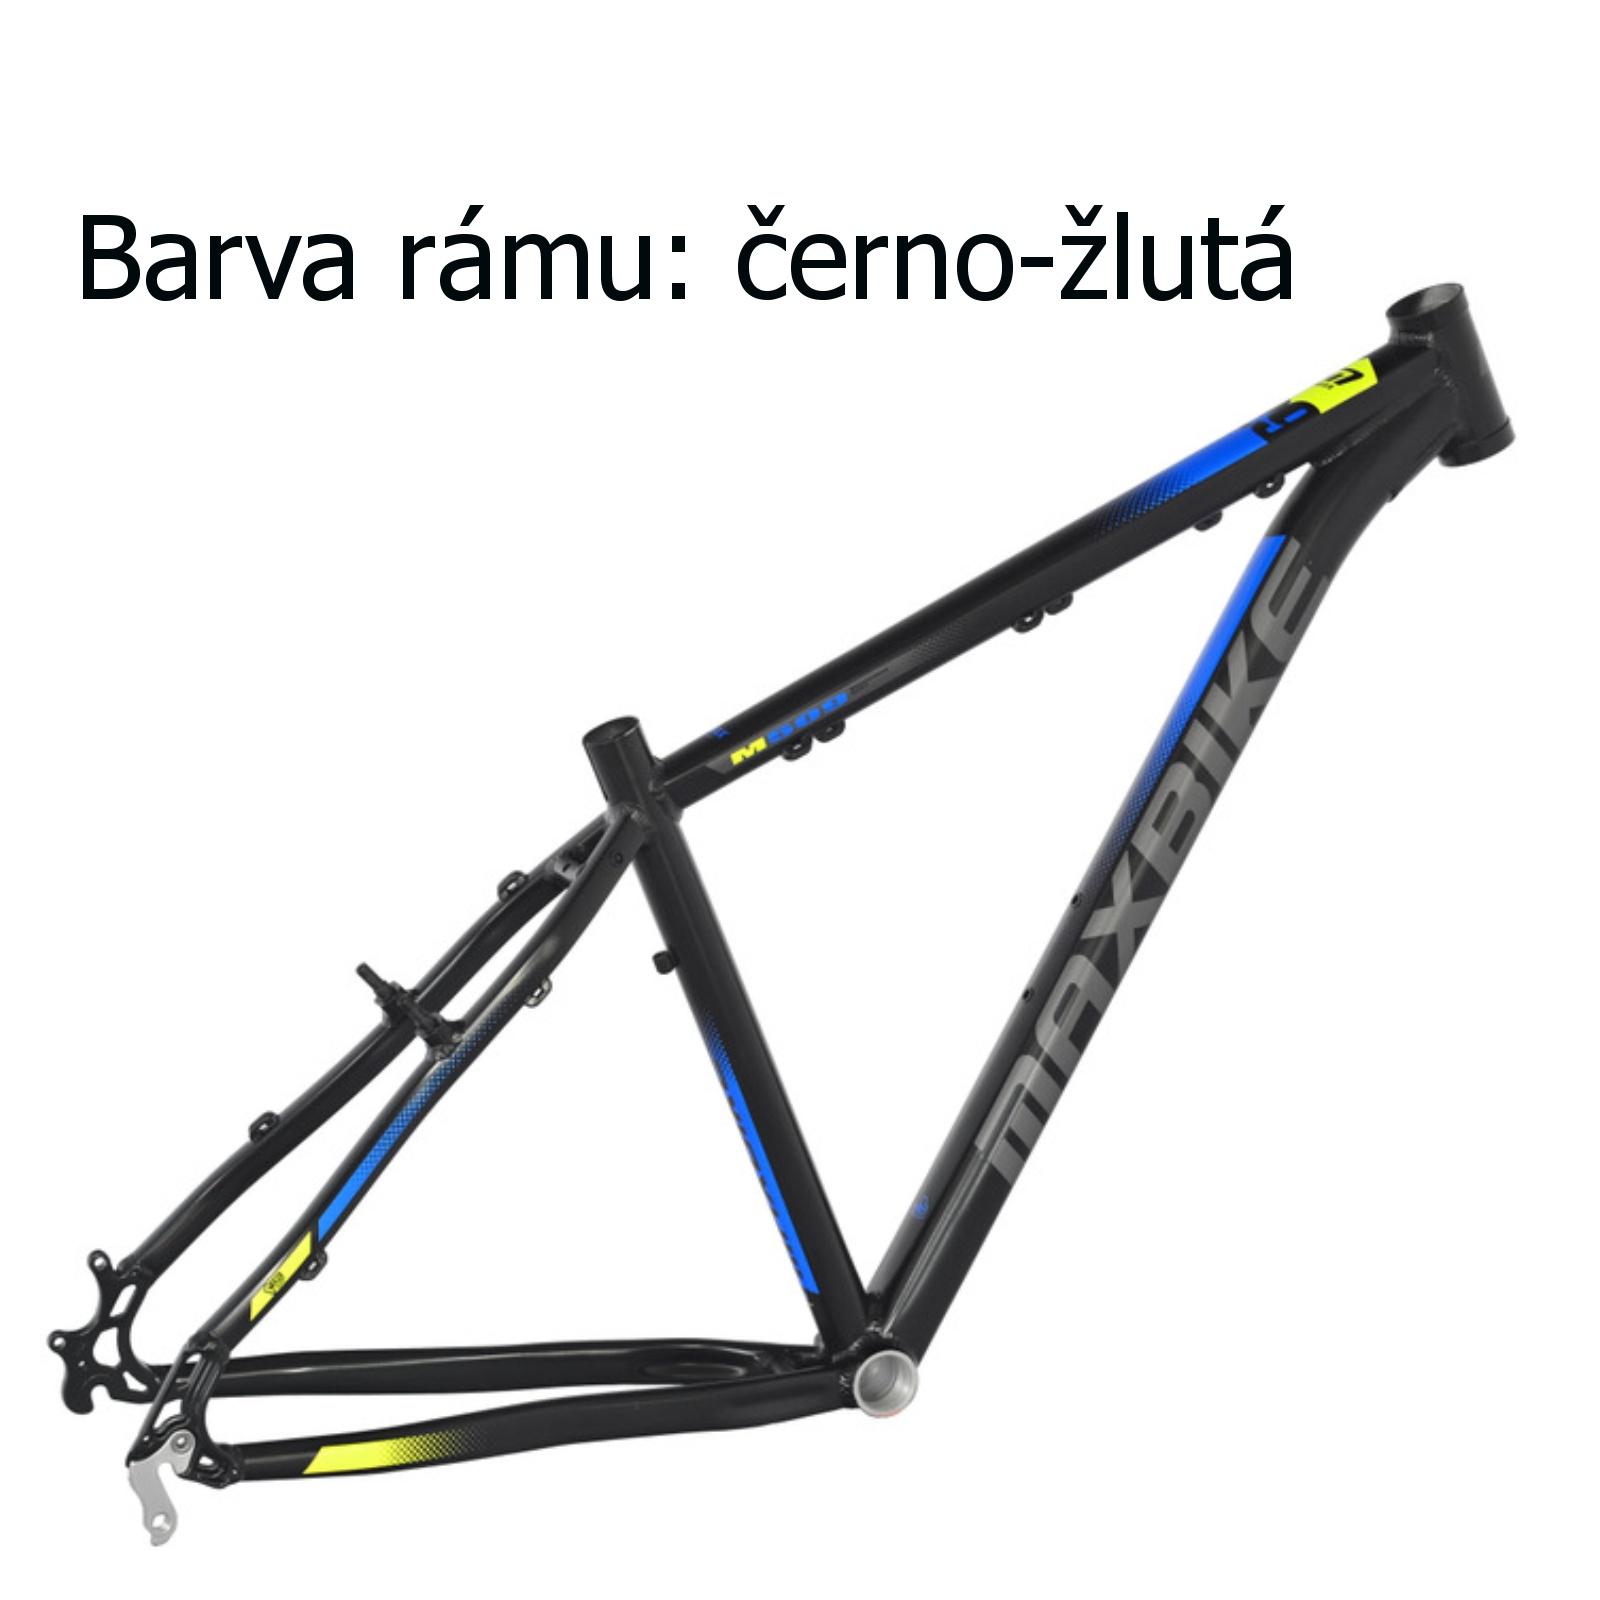 "Horské kolo MAXBIKE Apo 29 černo-žluté - vel. rámu 19"""